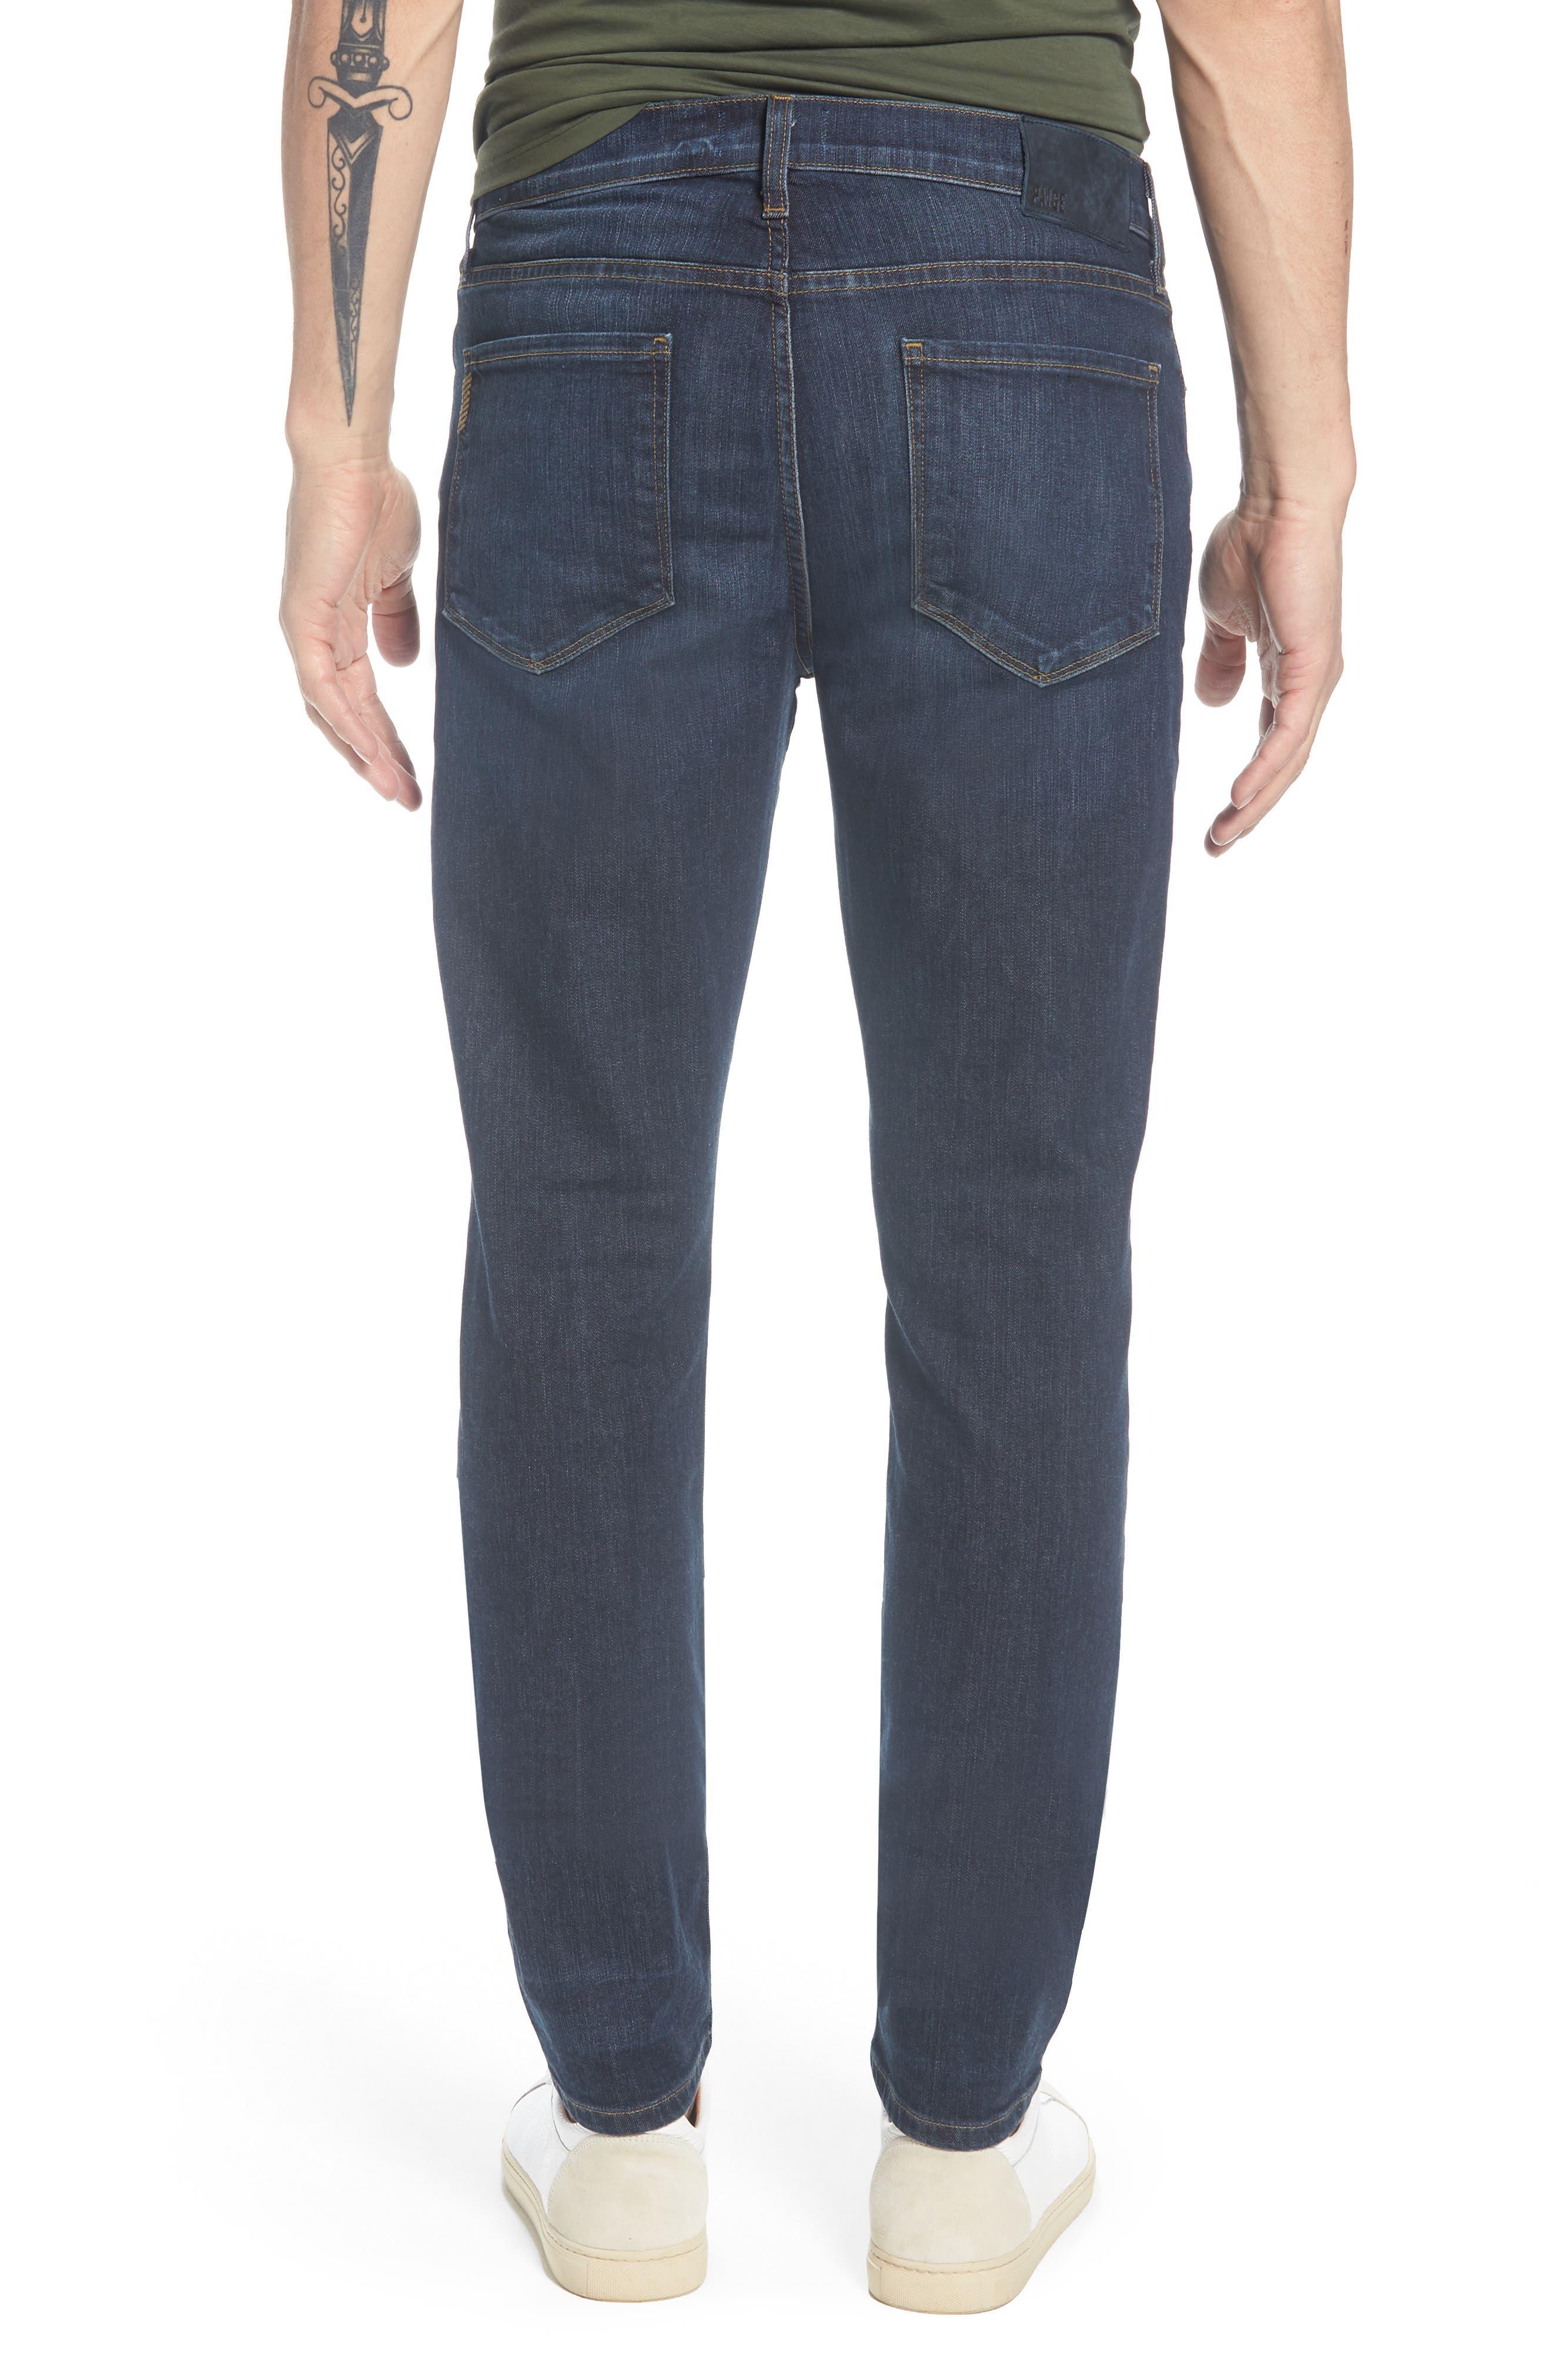 Transcend - Lennox Slim Fit Jeans,                             Alternate thumbnail 2, color,                             Hestan